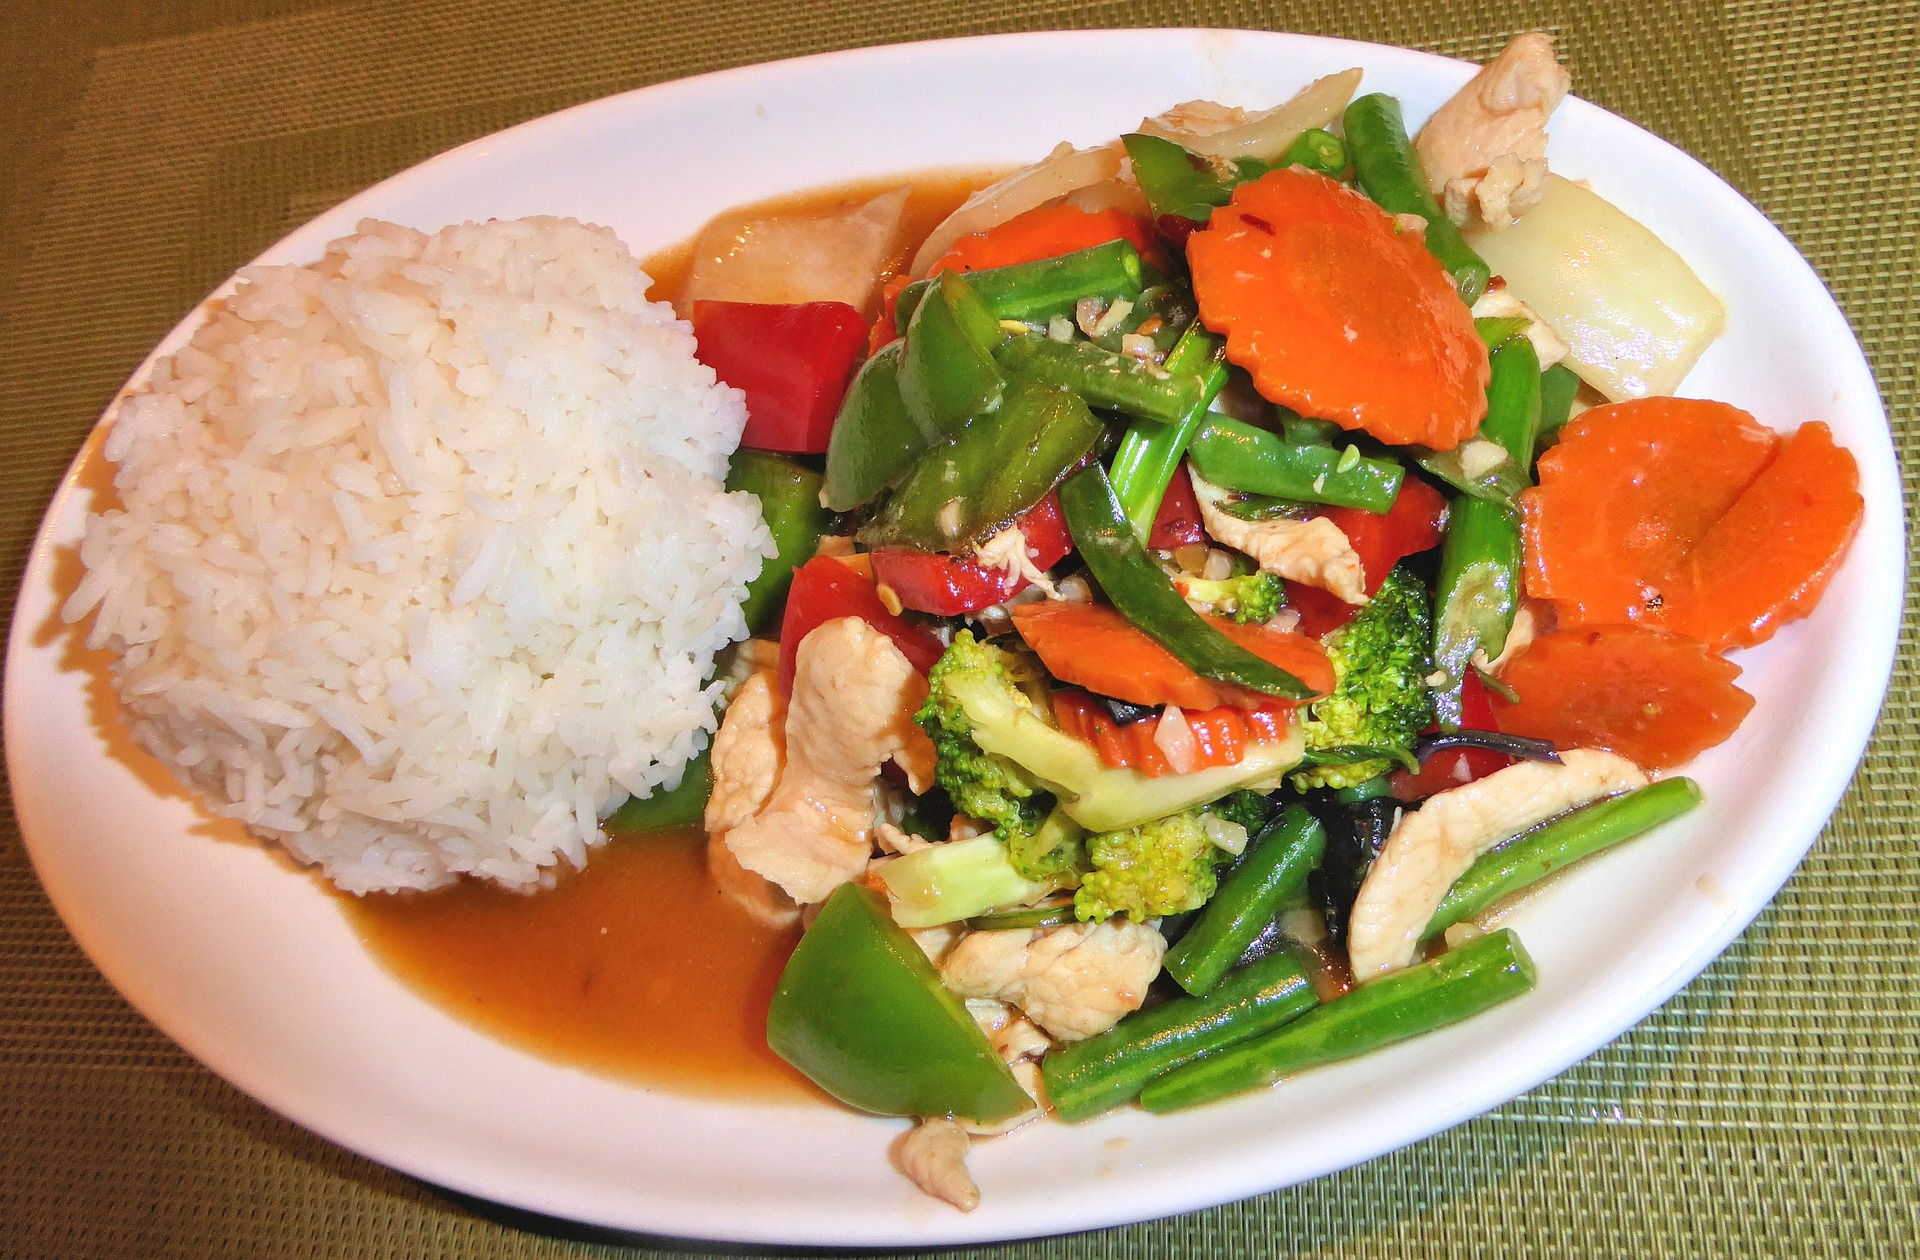 Turkey Tenderloins with vegetables